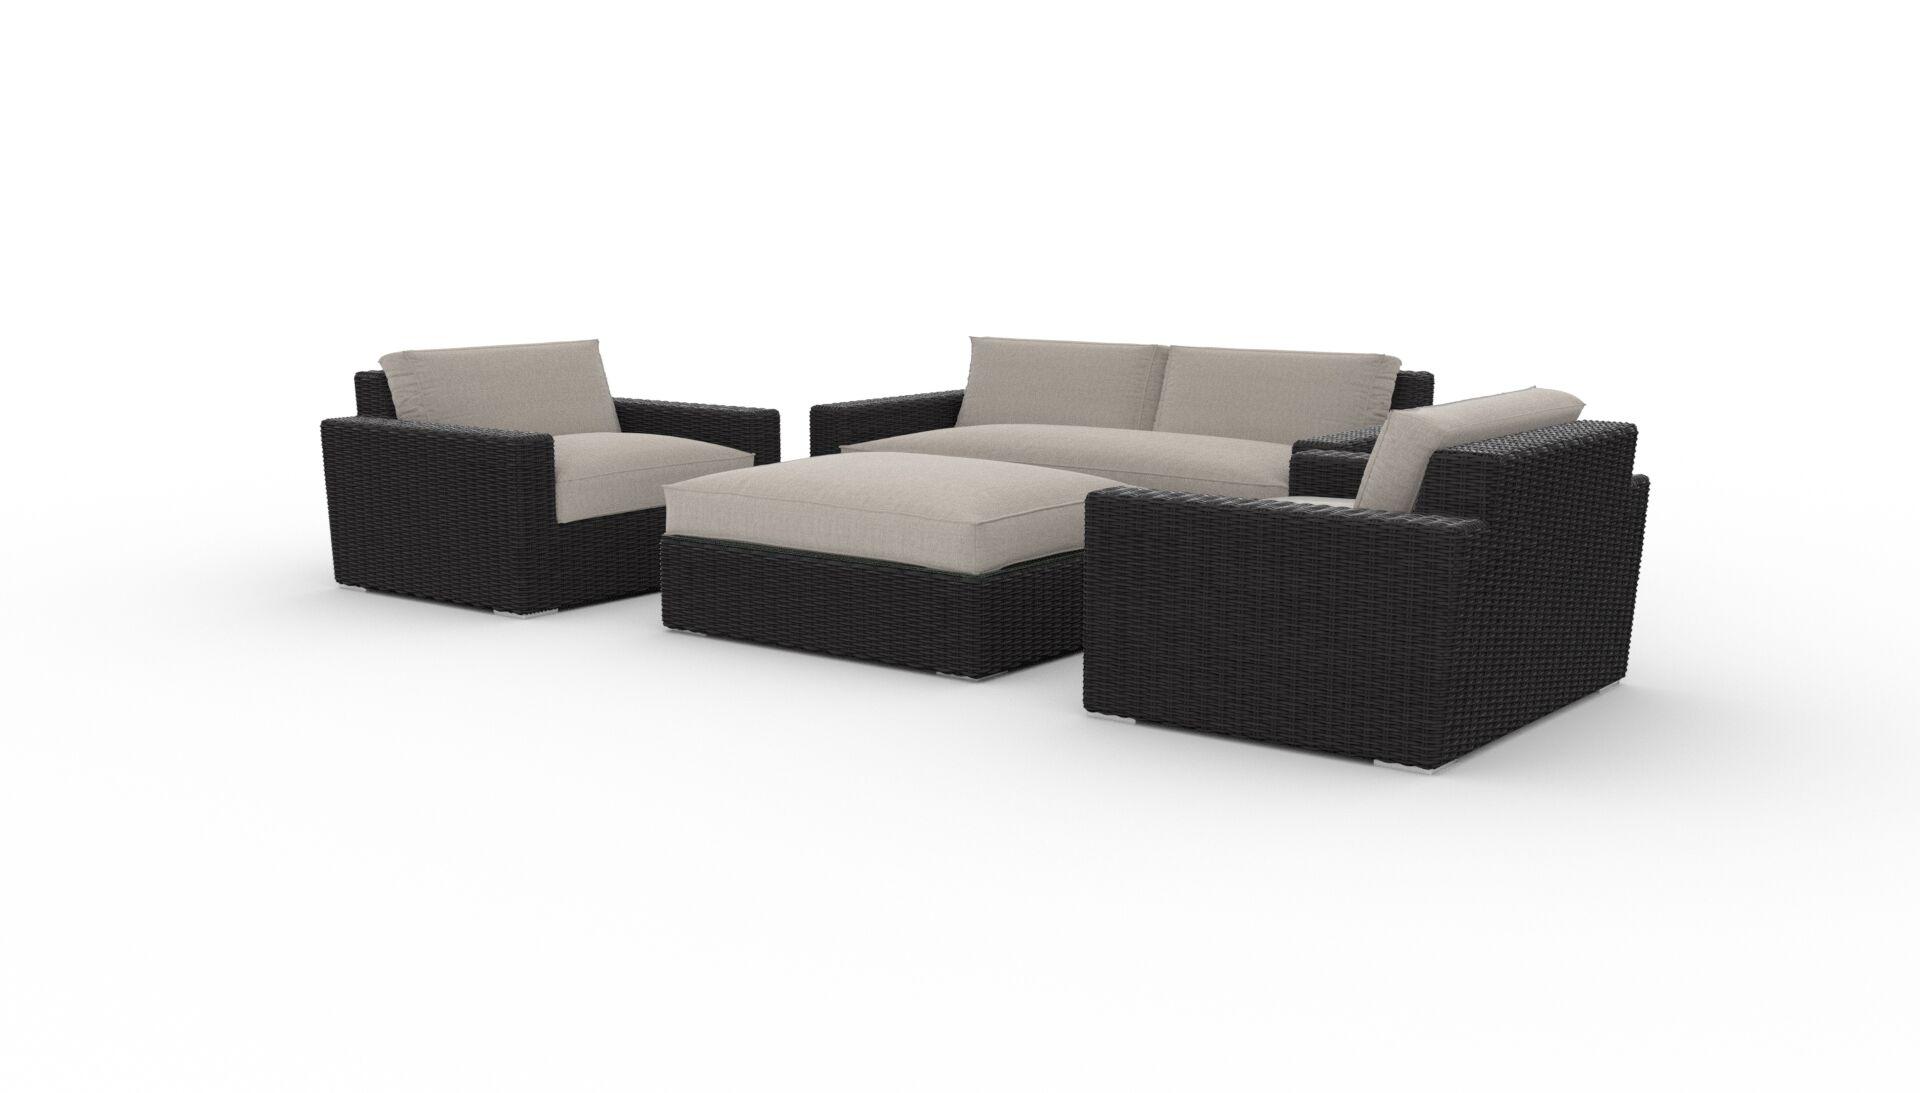 Borba 4 Piece Rattan Sunbrella Sofa Set with Cushions Cushion Color: Cast Ash